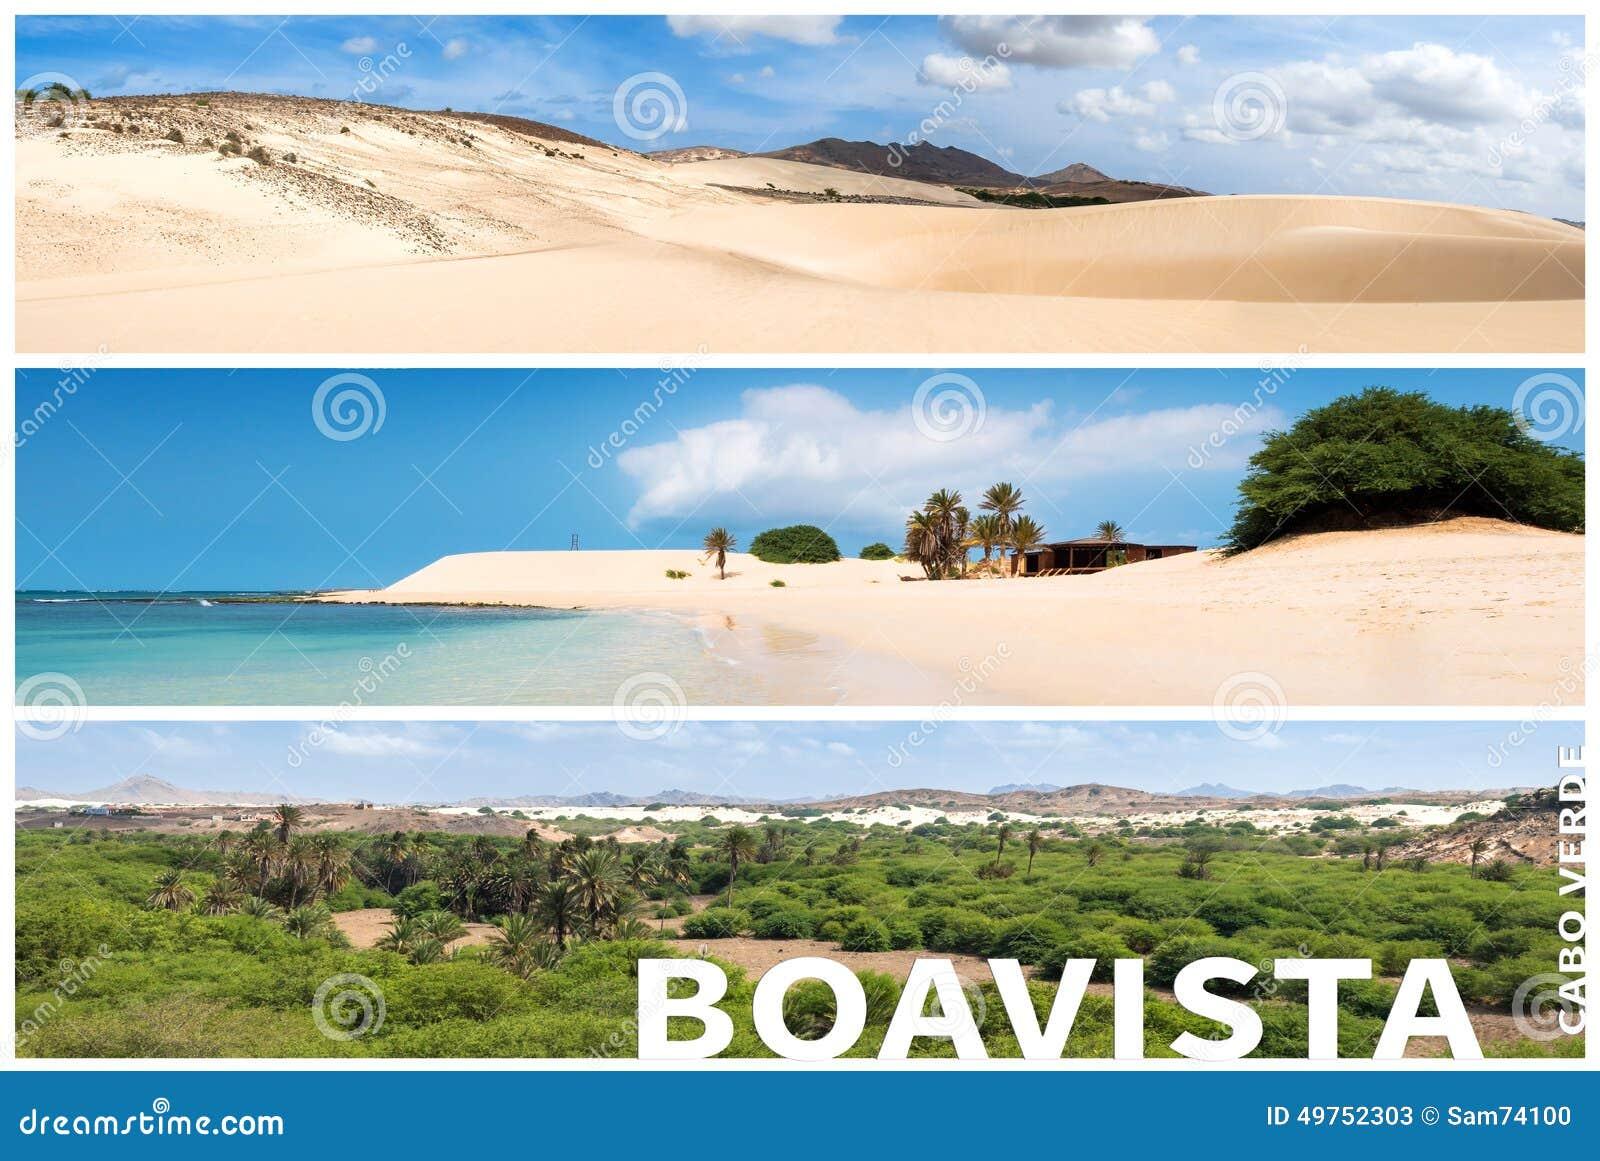 picture montage of boavista island landscapes in cape. Black Bedroom Furniture Sets. Home Design Ideas